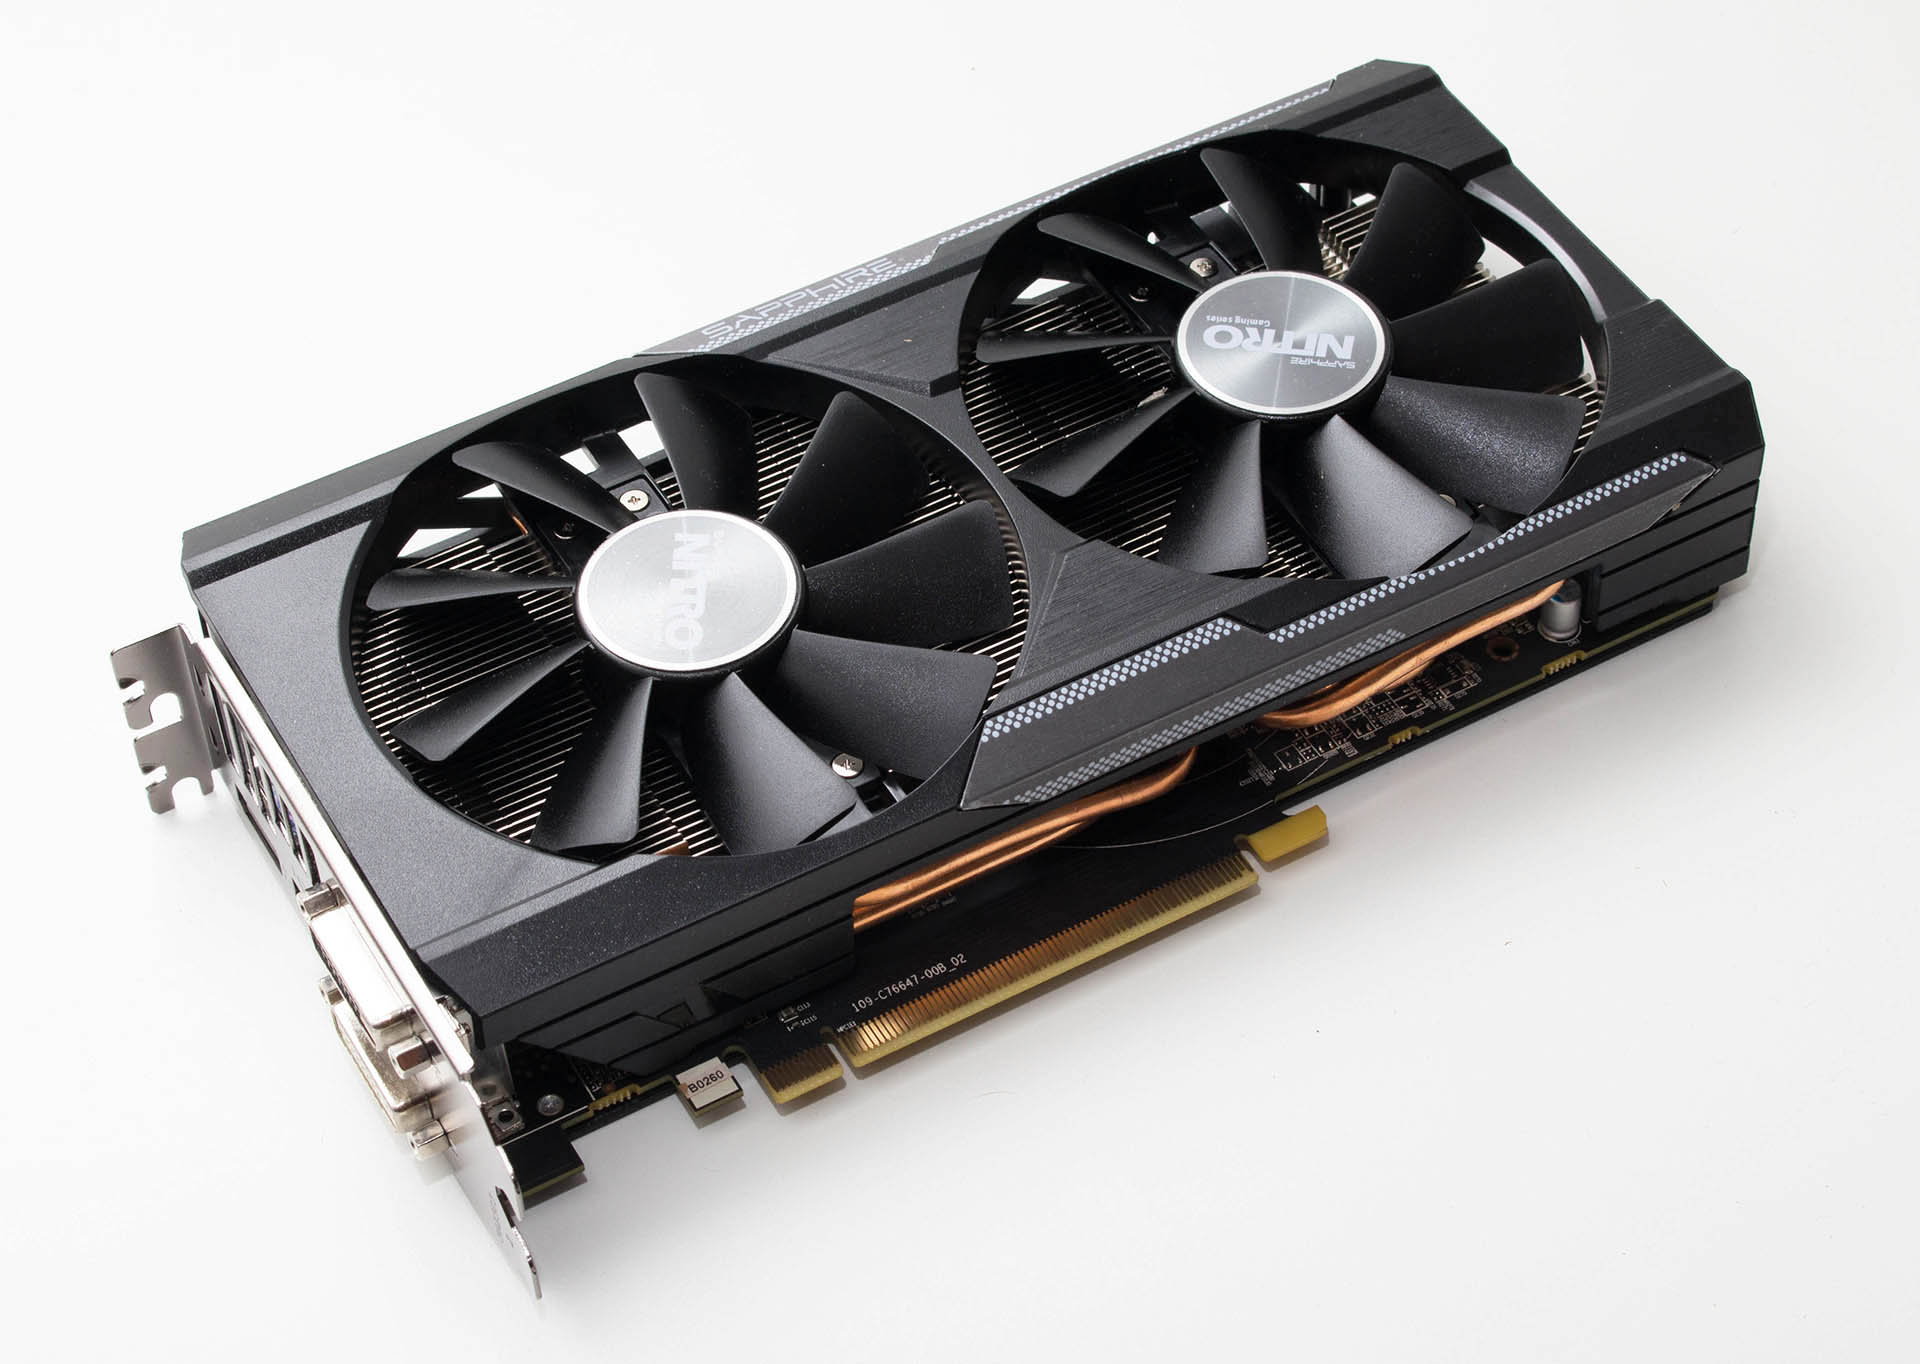 Sapphire R9 380X Nitro 4GB OC test